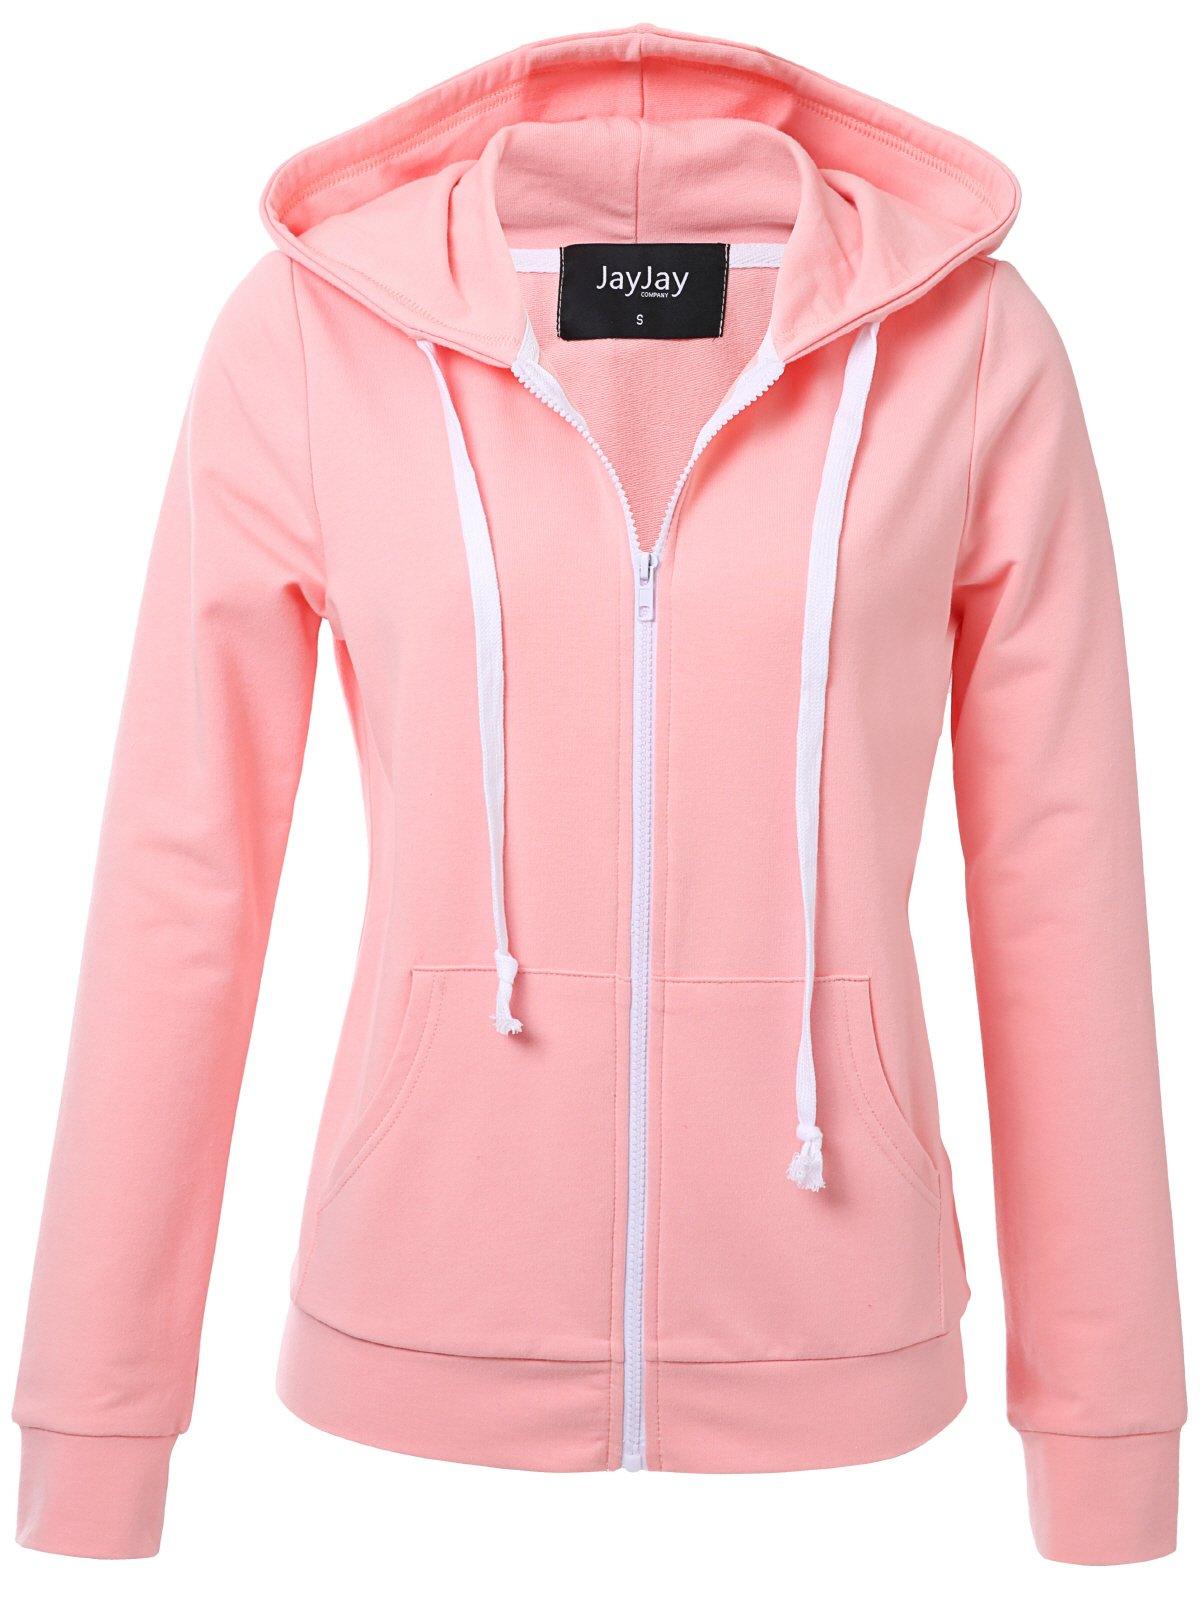 JayJay Women Athlete Stretchy Full Zip Jersey Fashion Running Hoodie Long Sleeve Jacket,SAKURAPINK,2XL